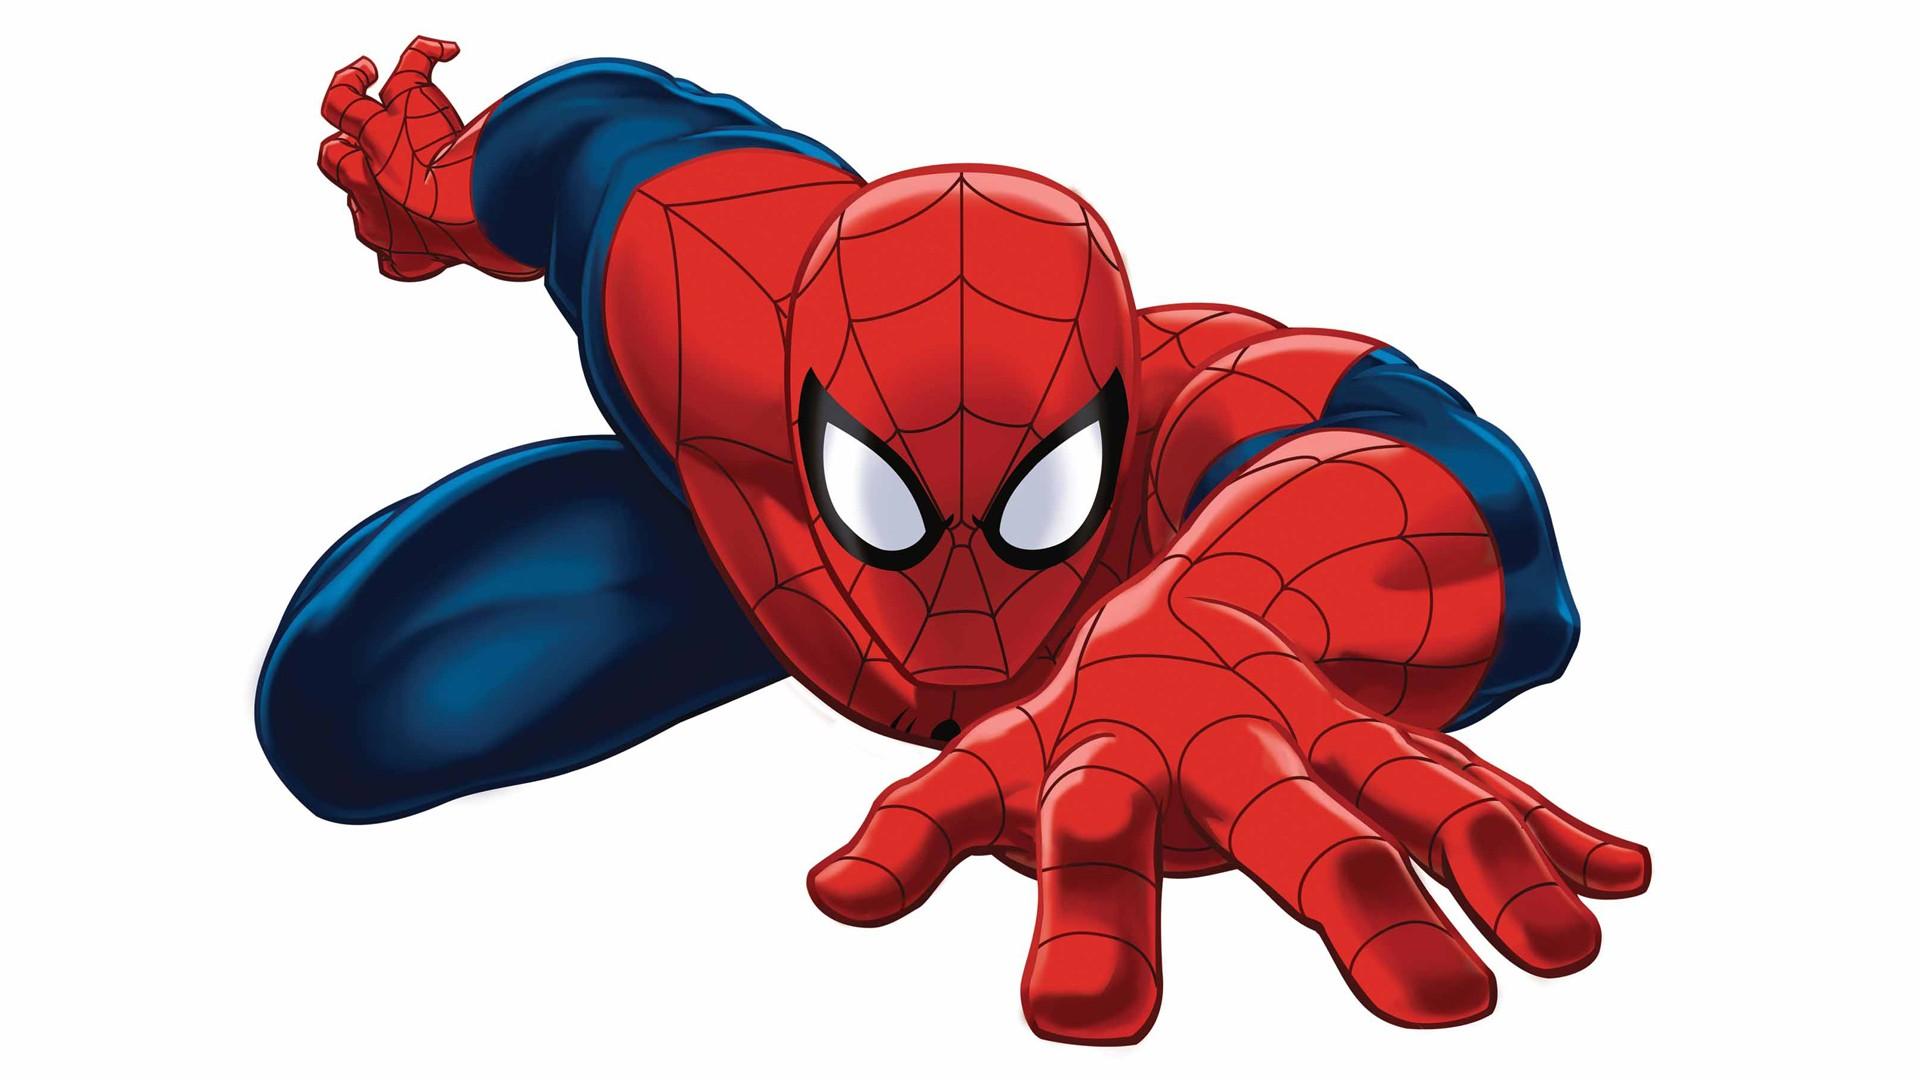 Cartoon Network clipart spiderman Art Spiderman on Clip Cartoon